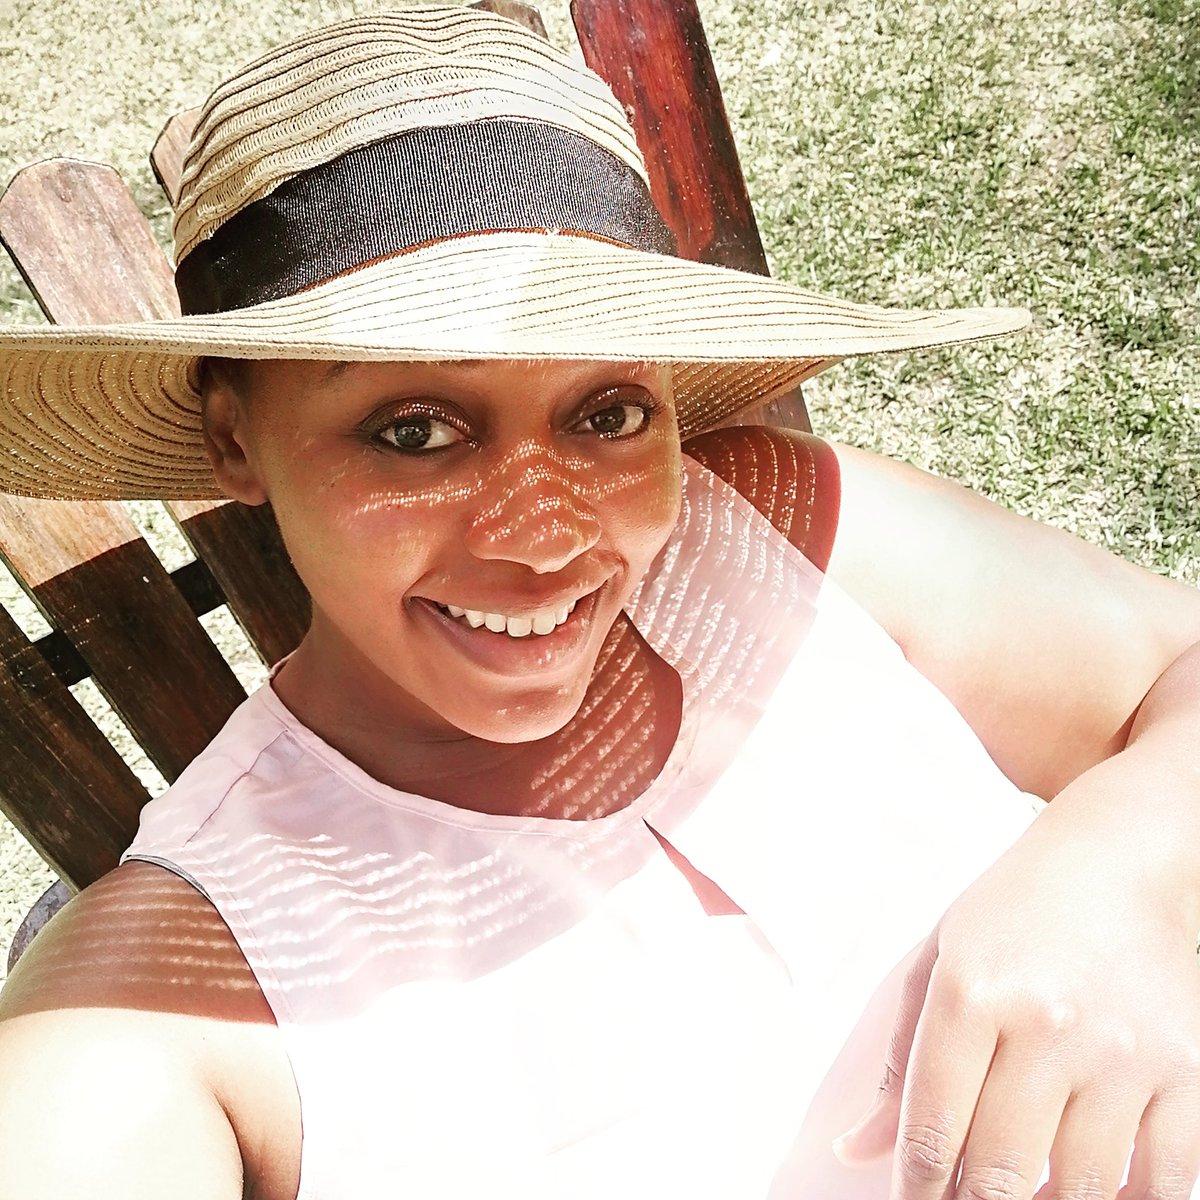 RT @lupwesha: I liked today, got to break my routine a bit...I like exploring!  #sunnydays #sunhat #feelinghappy https://t.co/pgtbky4fYw